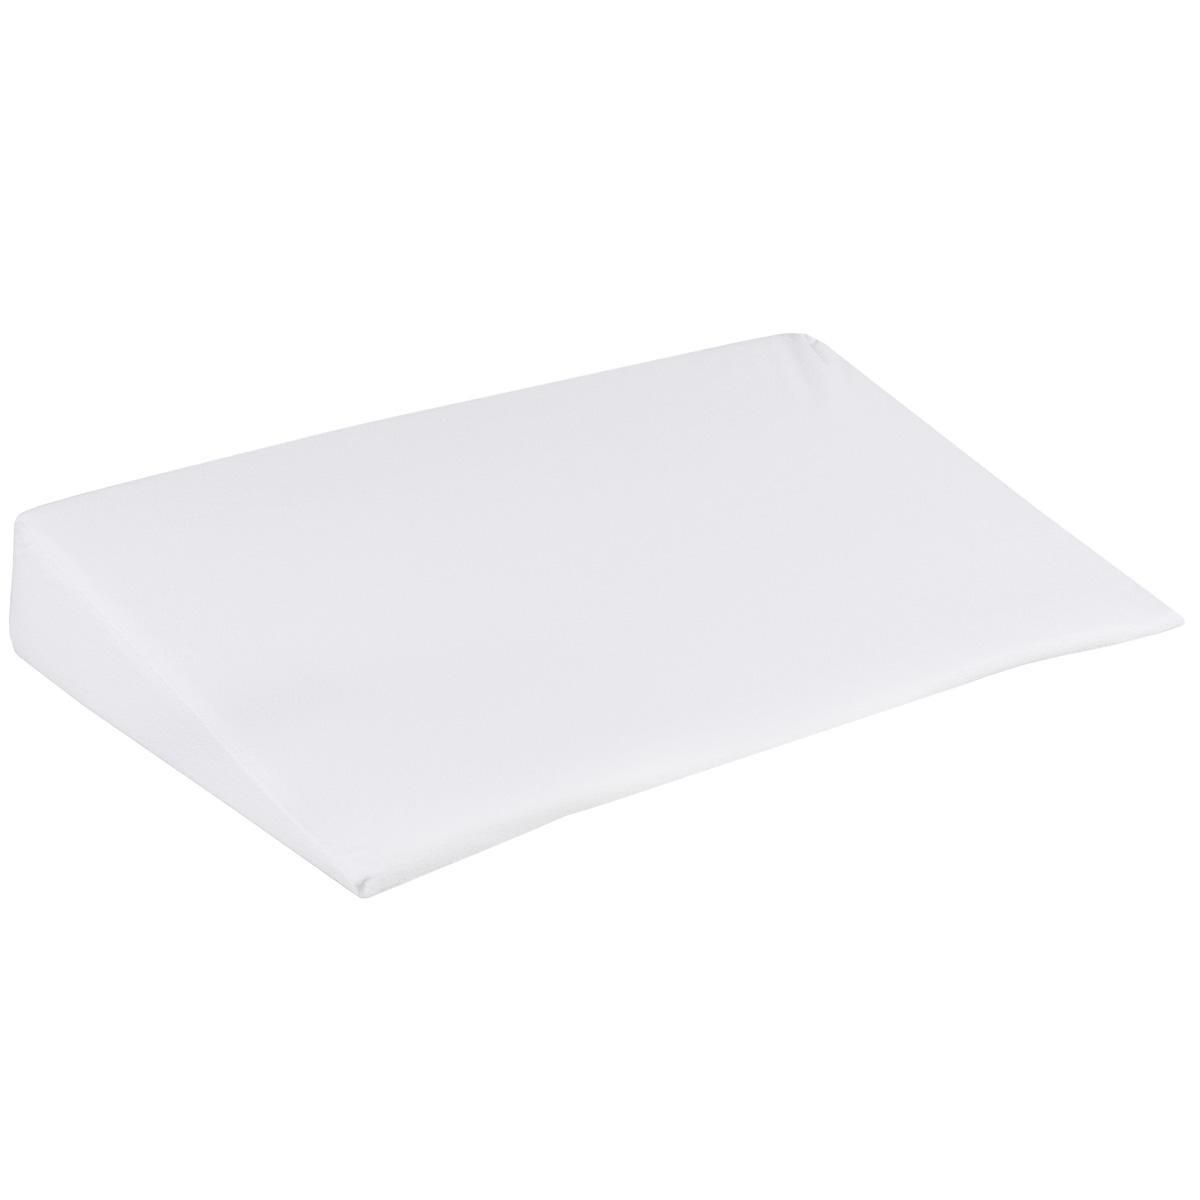 Подушка для младенца Selby, цвет: белый, 59 см х 35 см5529п